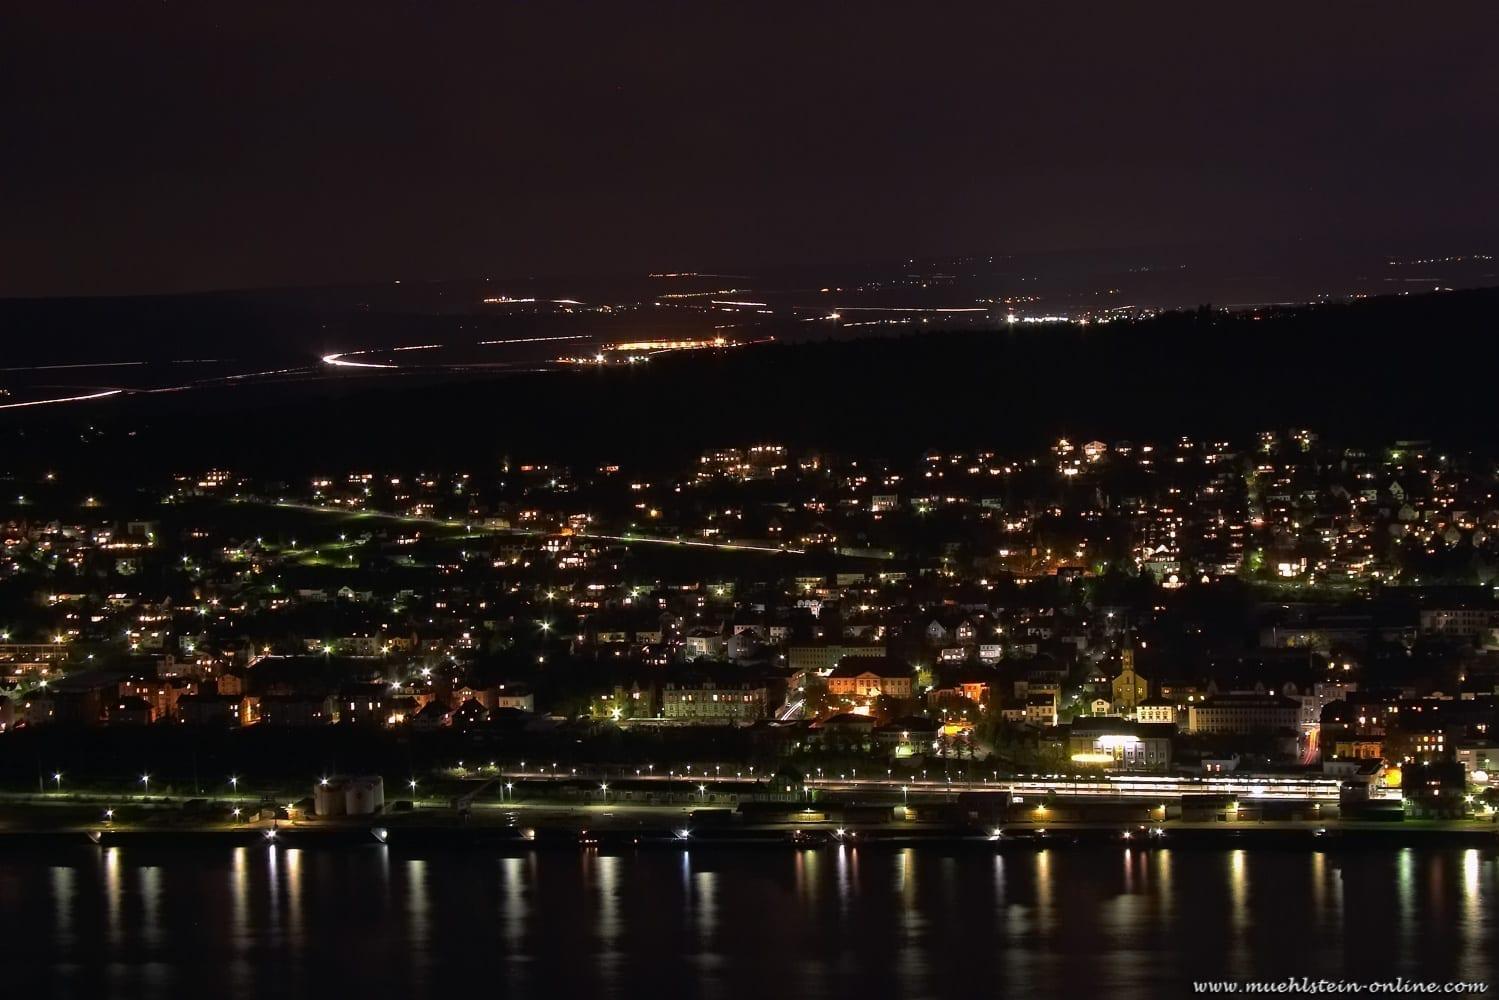 Nachtfoto Bingen. 20 Sekunden Langzeitbelichtung.